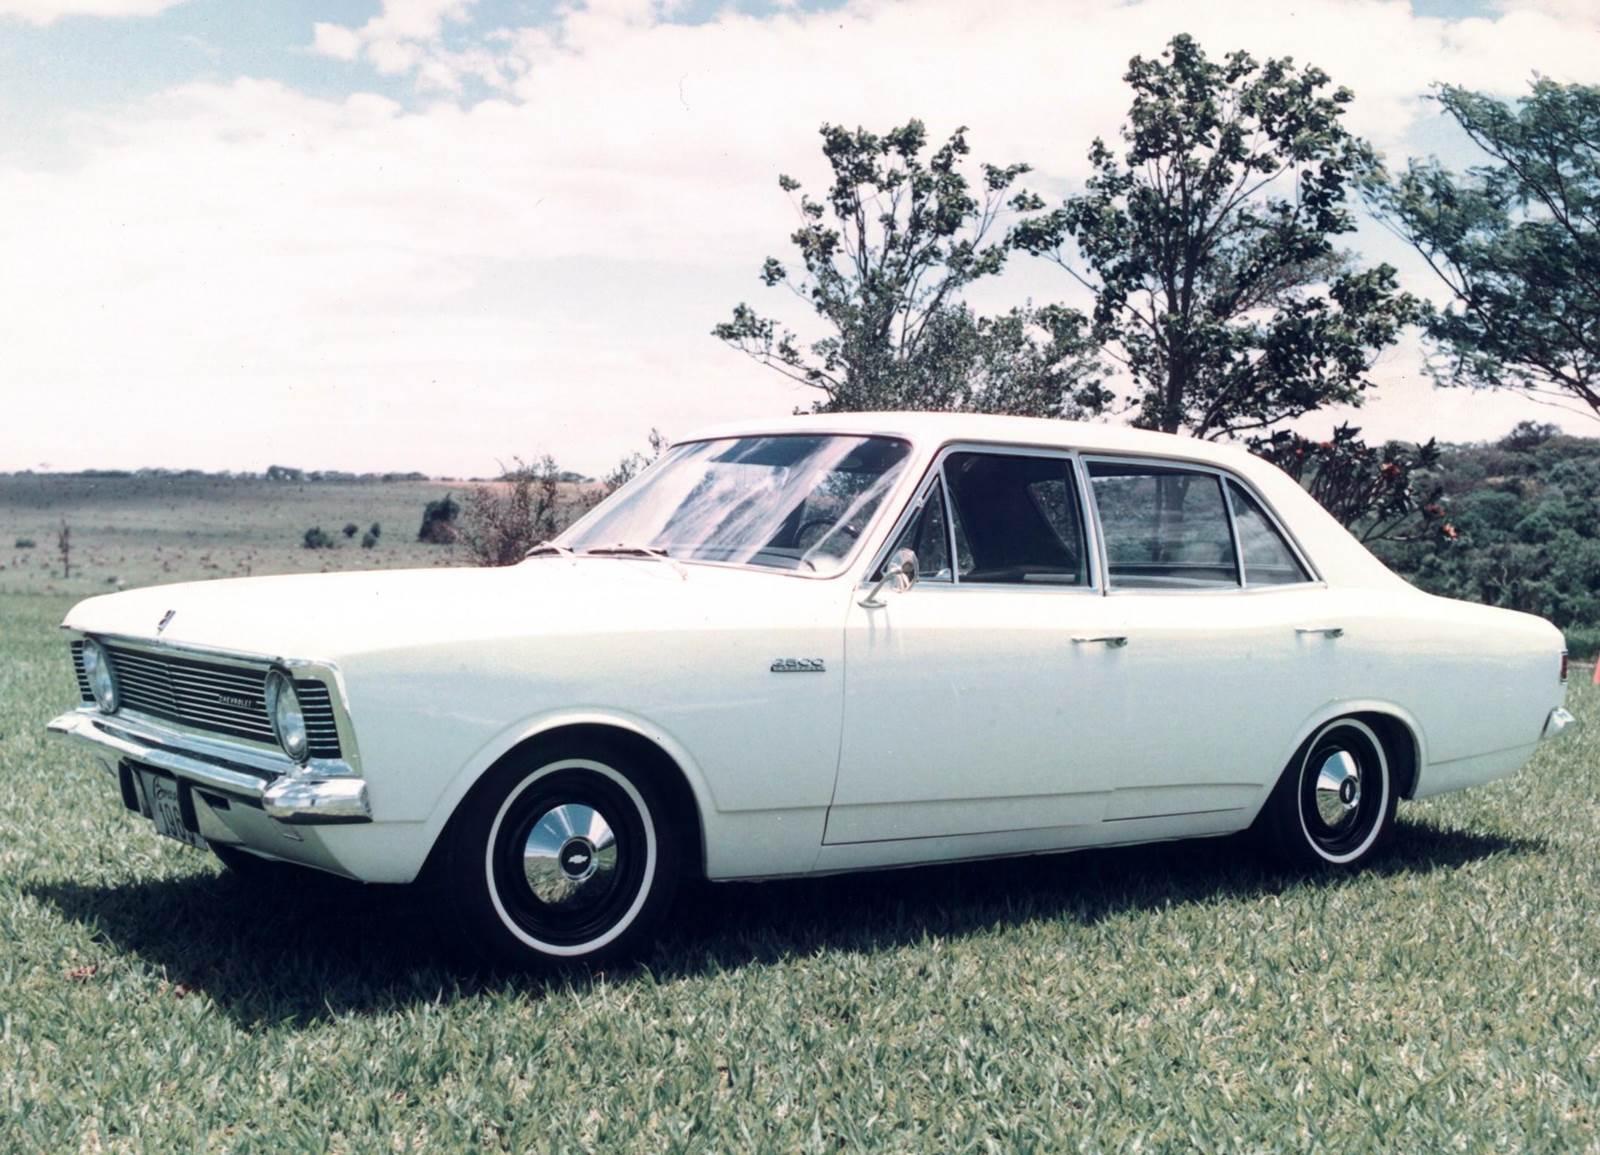 Carros Que Amamos #07 – Chevrolet Opala